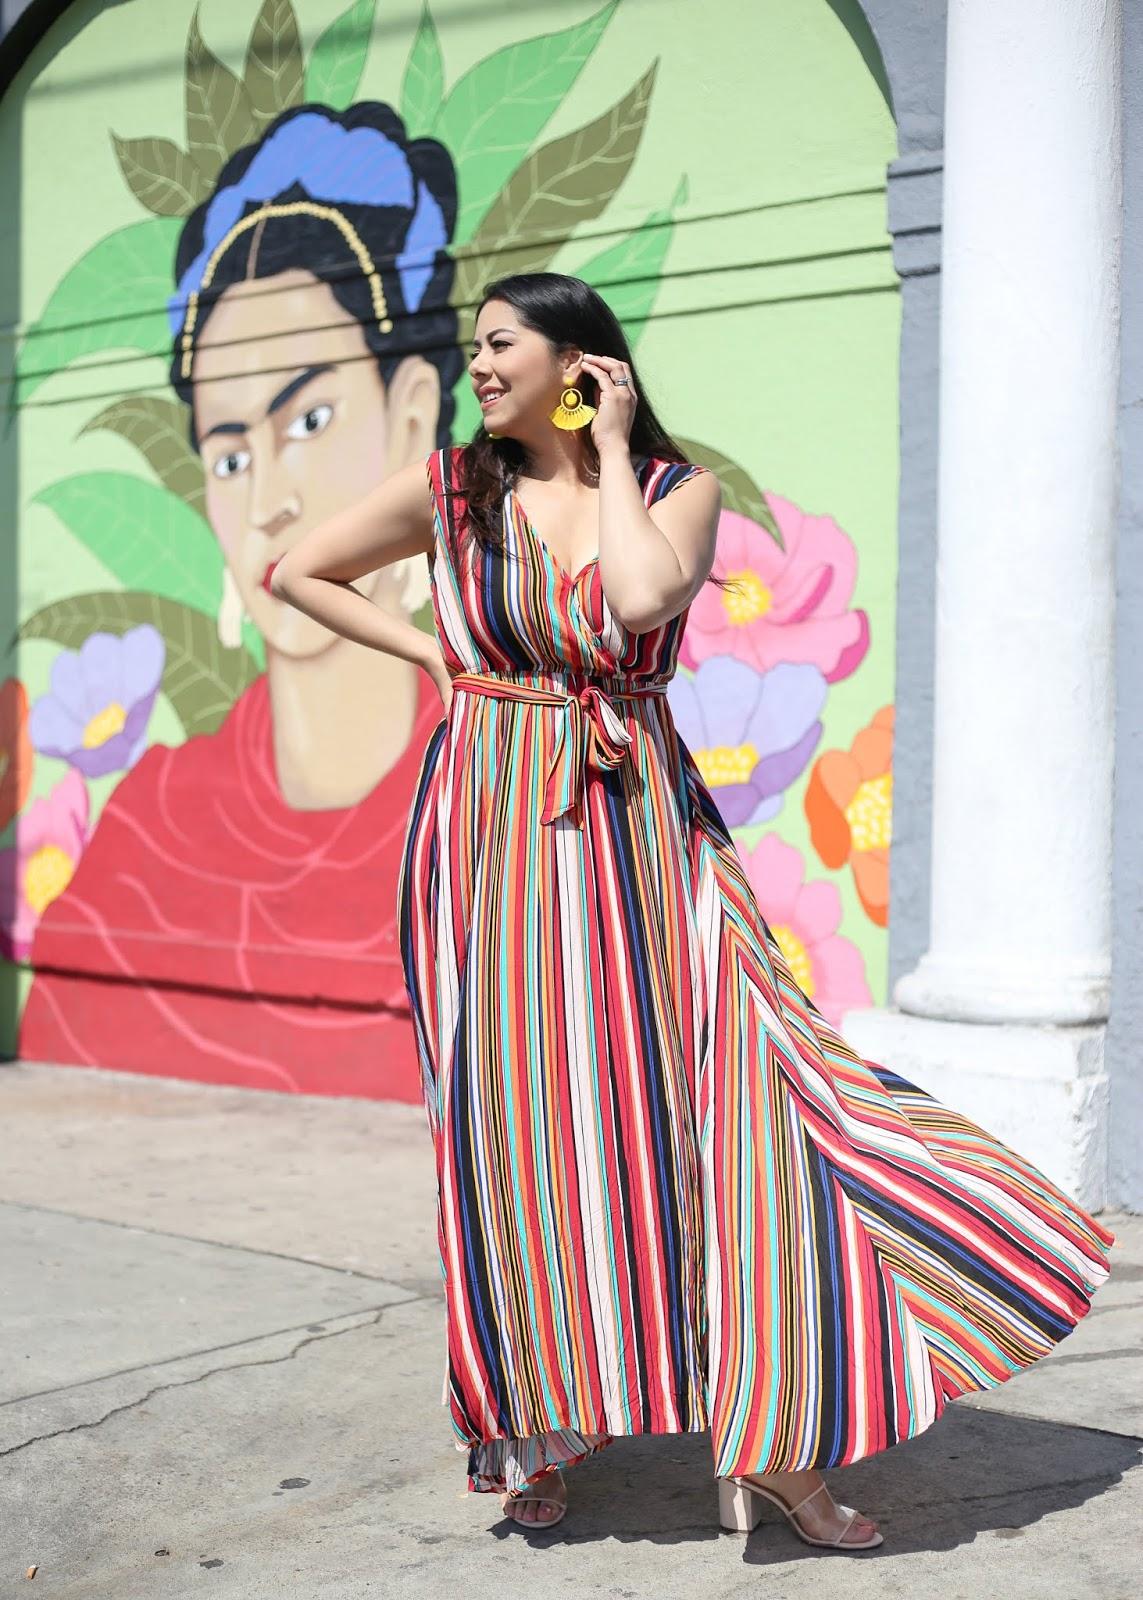 Barrio Logan Frida mural, Frida Mural in San Diego, Barrio logan murals